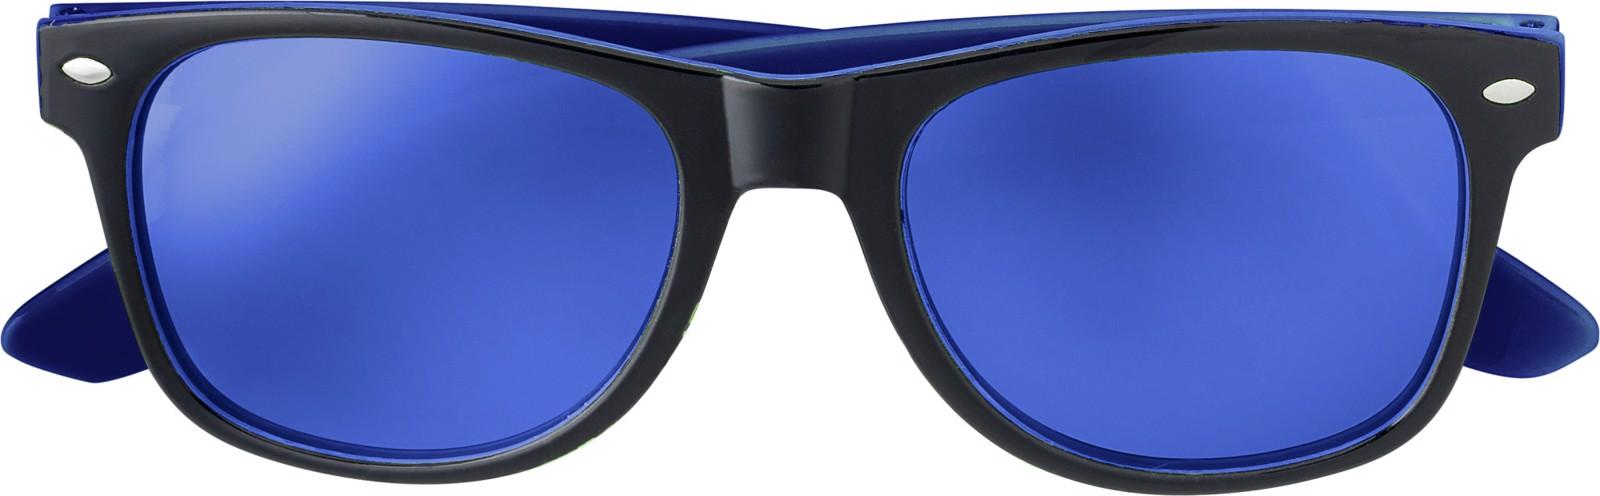 Acrylic sunglasses - Cobalt Blue